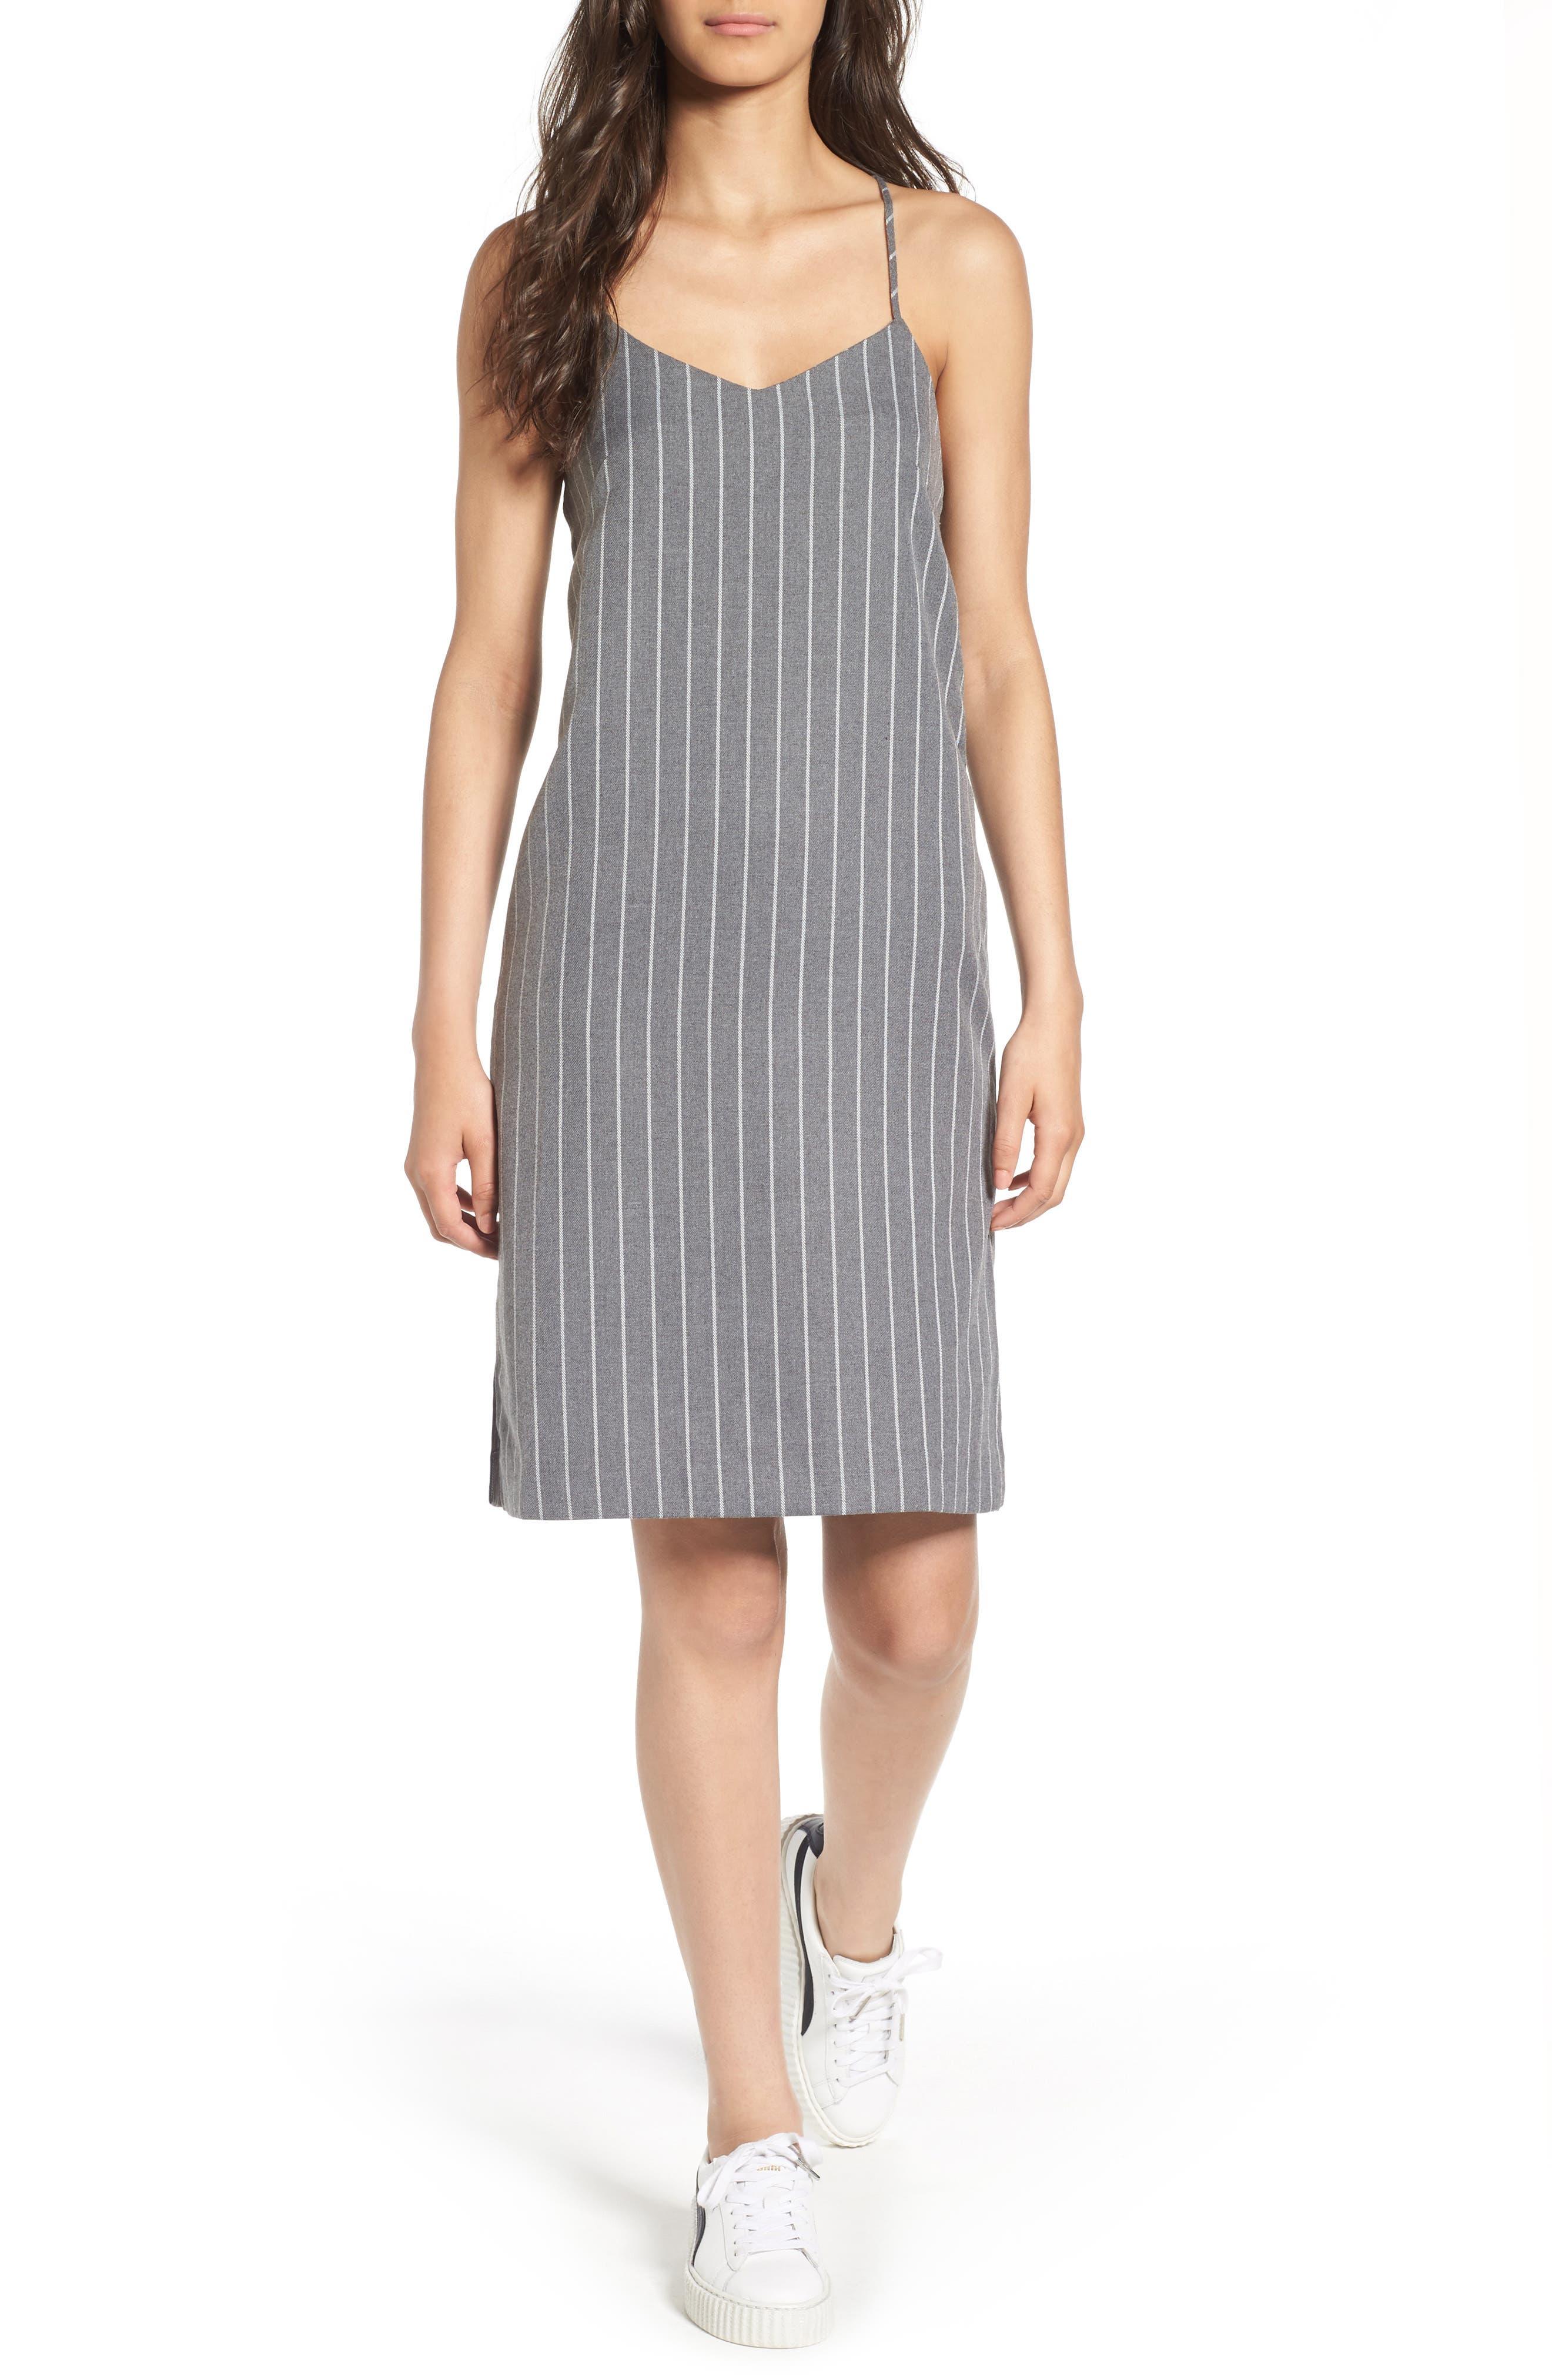 Everly Stripe Slipdress